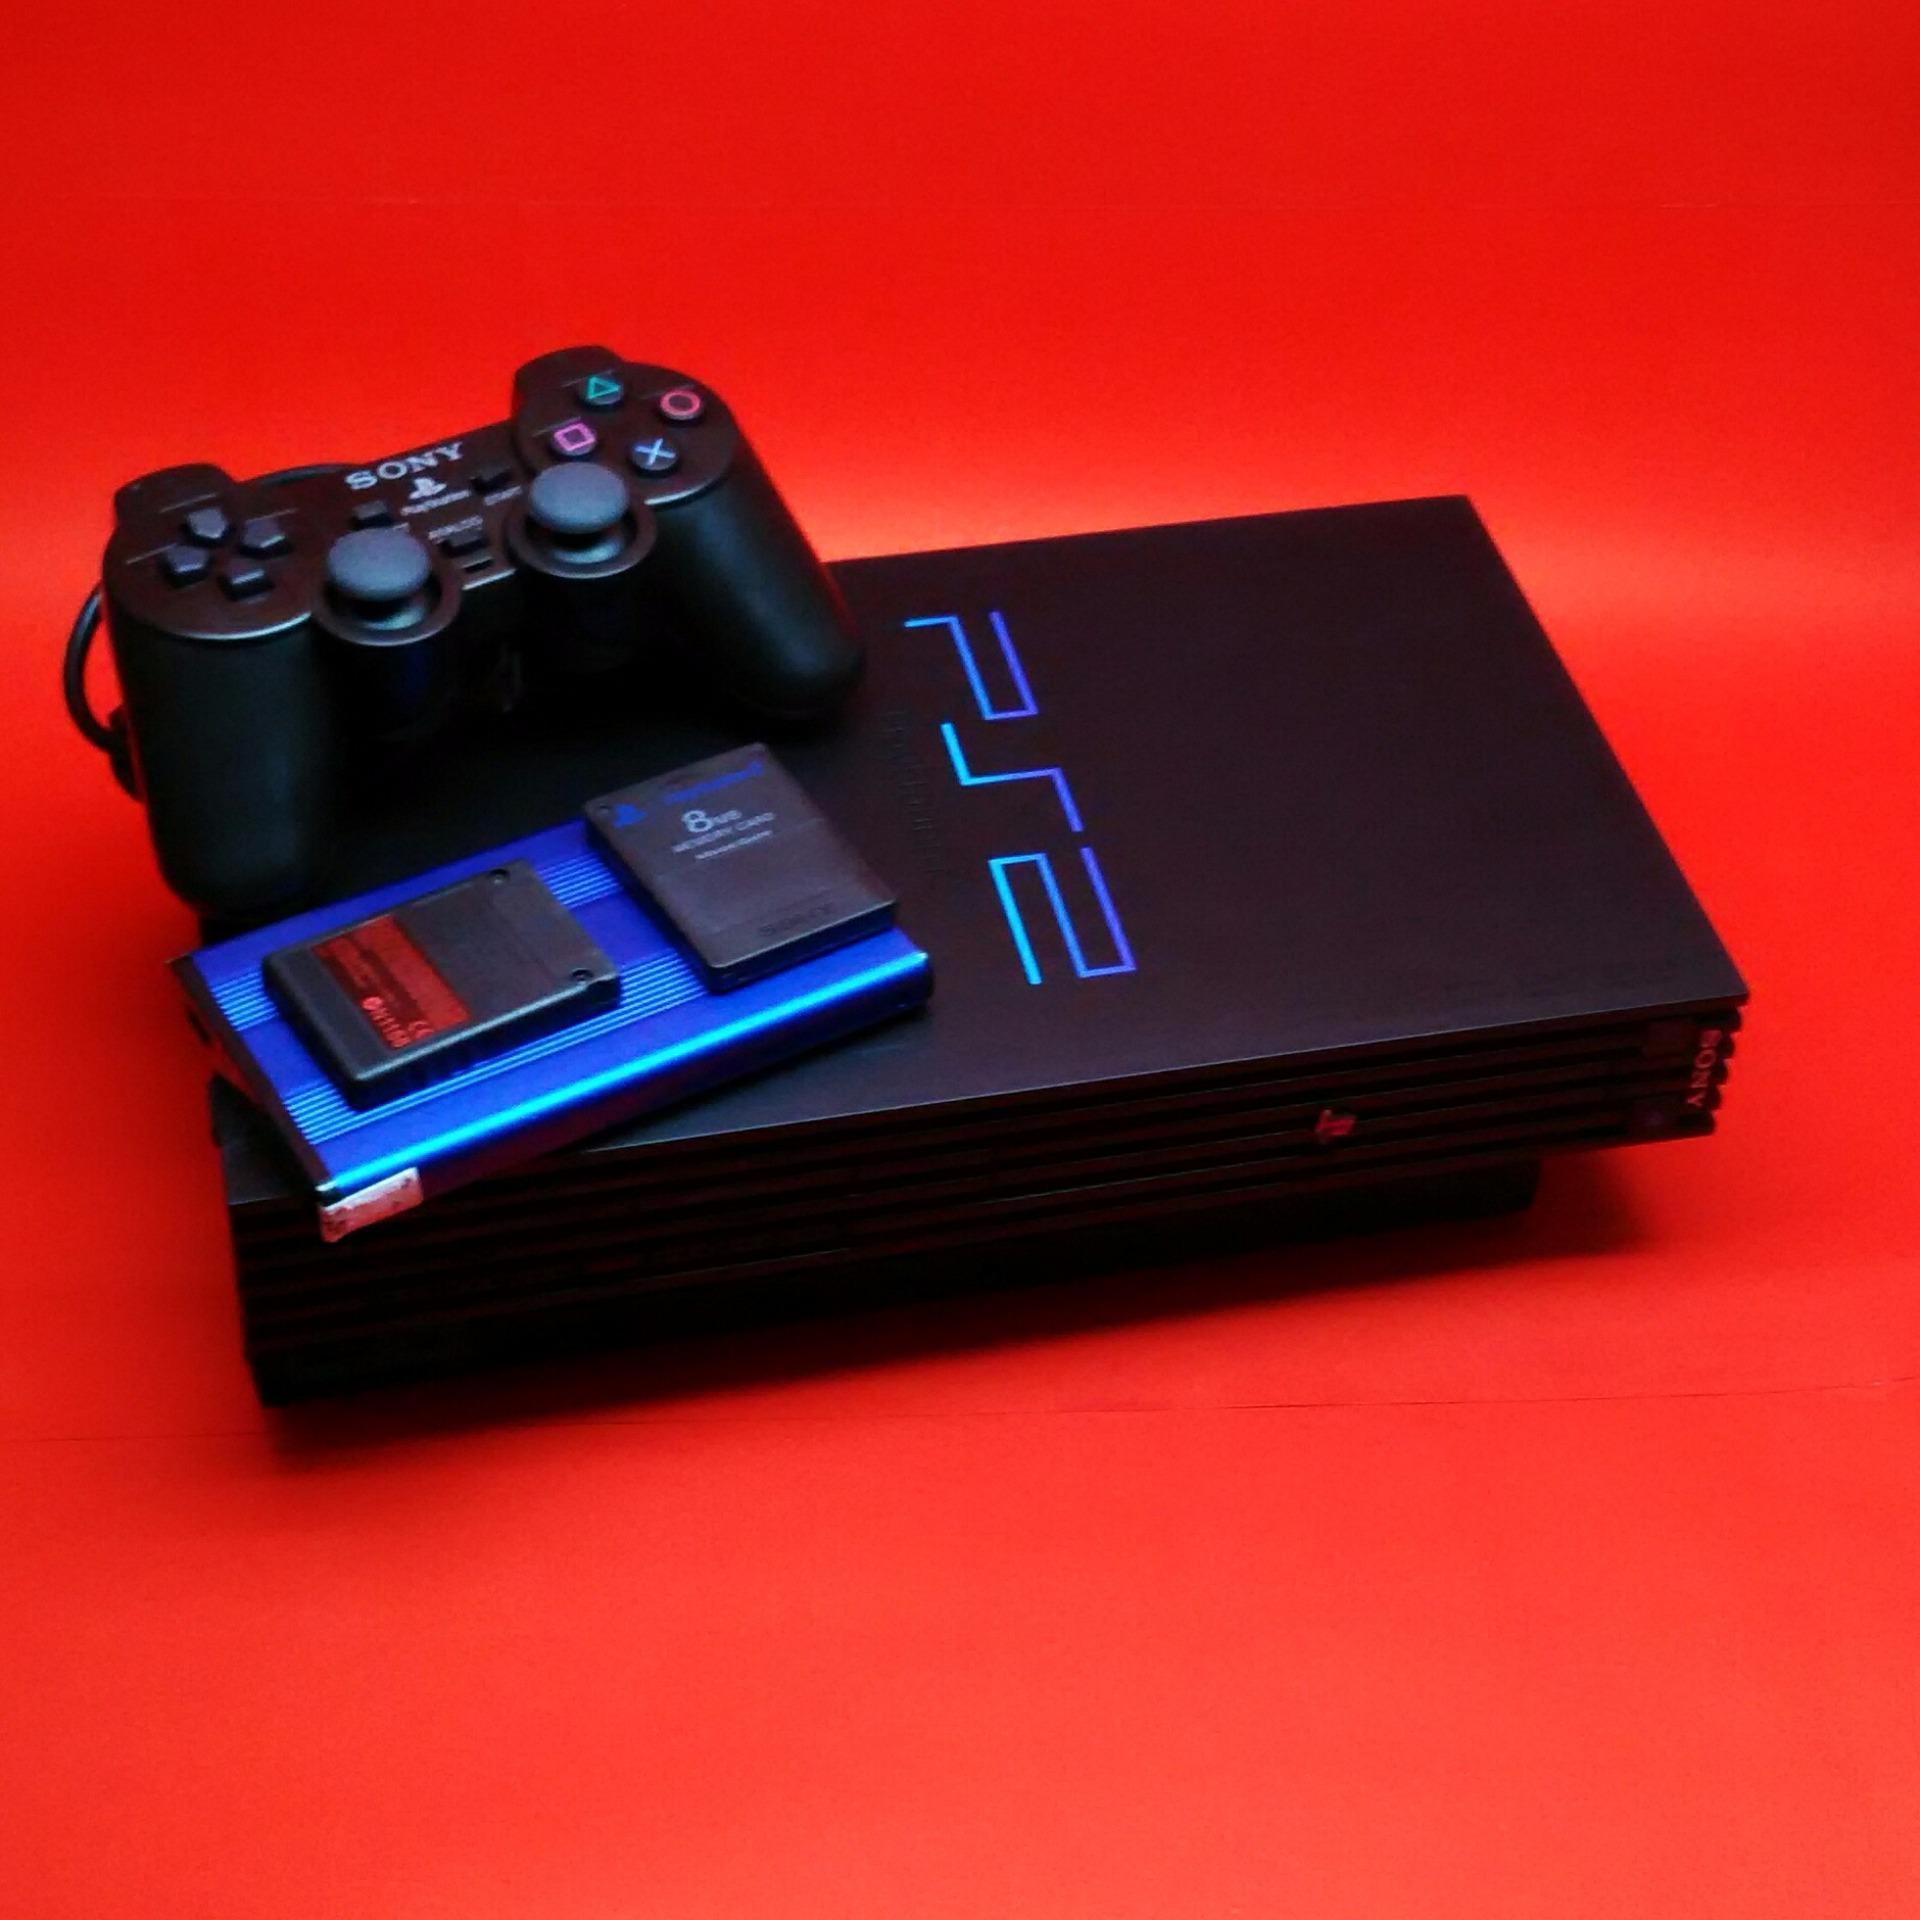 Online Murah Ps2 Sony Playstation 2 Usb Harddisk 40 Gb Console Black Hardisk External 40gb Free Games Mmc